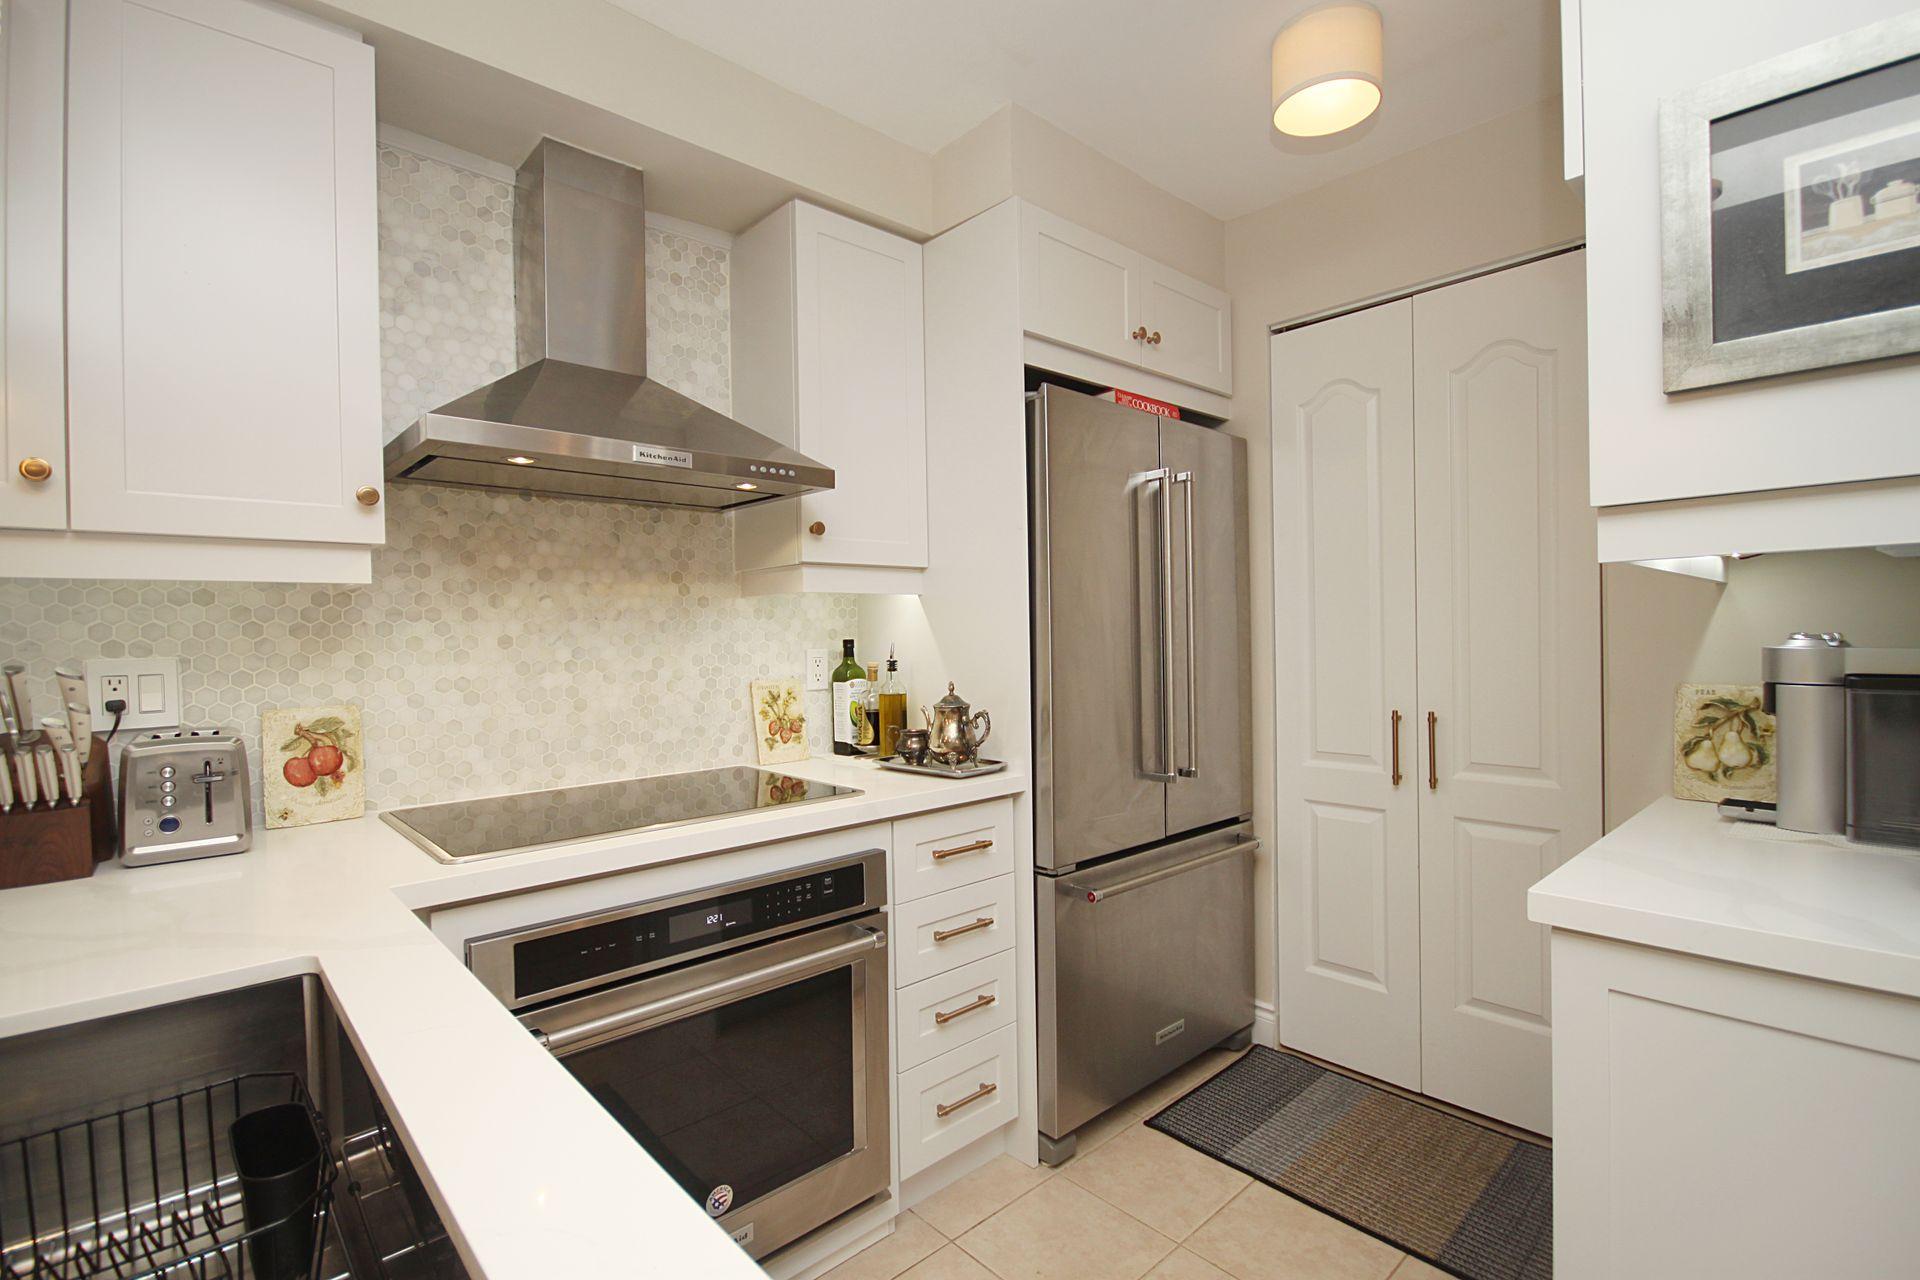 Kitchen at 310 - 28 William Carson Crescent, St. Andrew-Windfields, Toronto